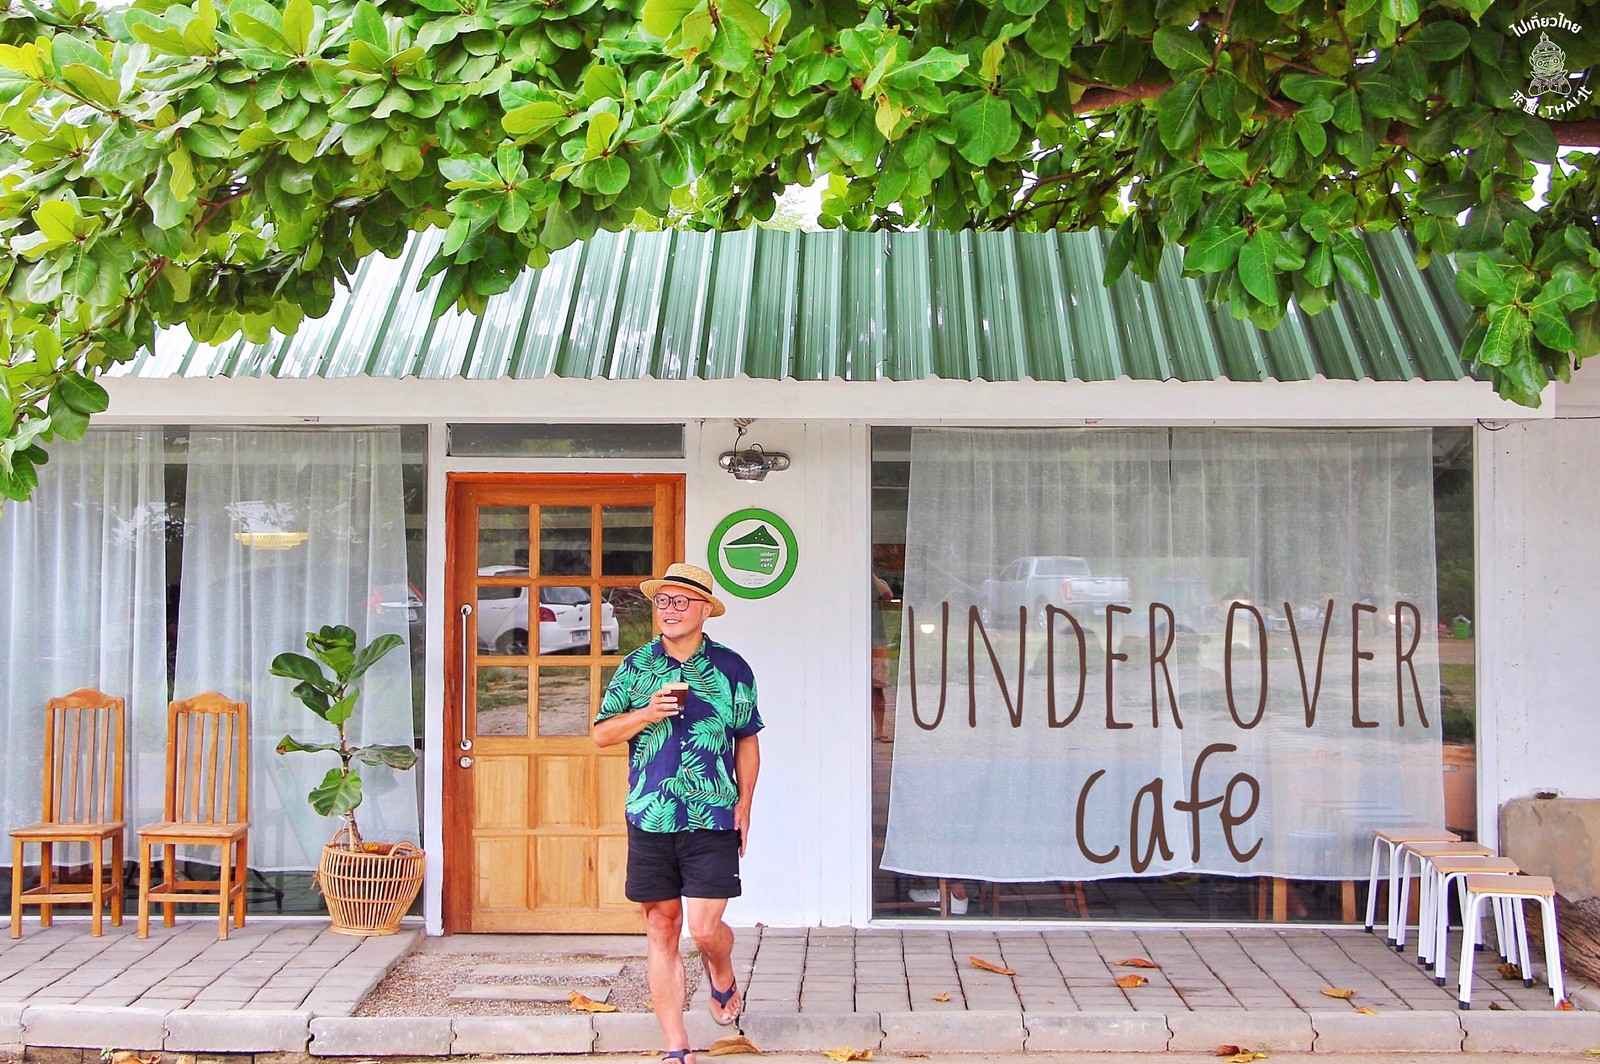 大樹下的夢想咖啡館《UNDER OVER CAFE》